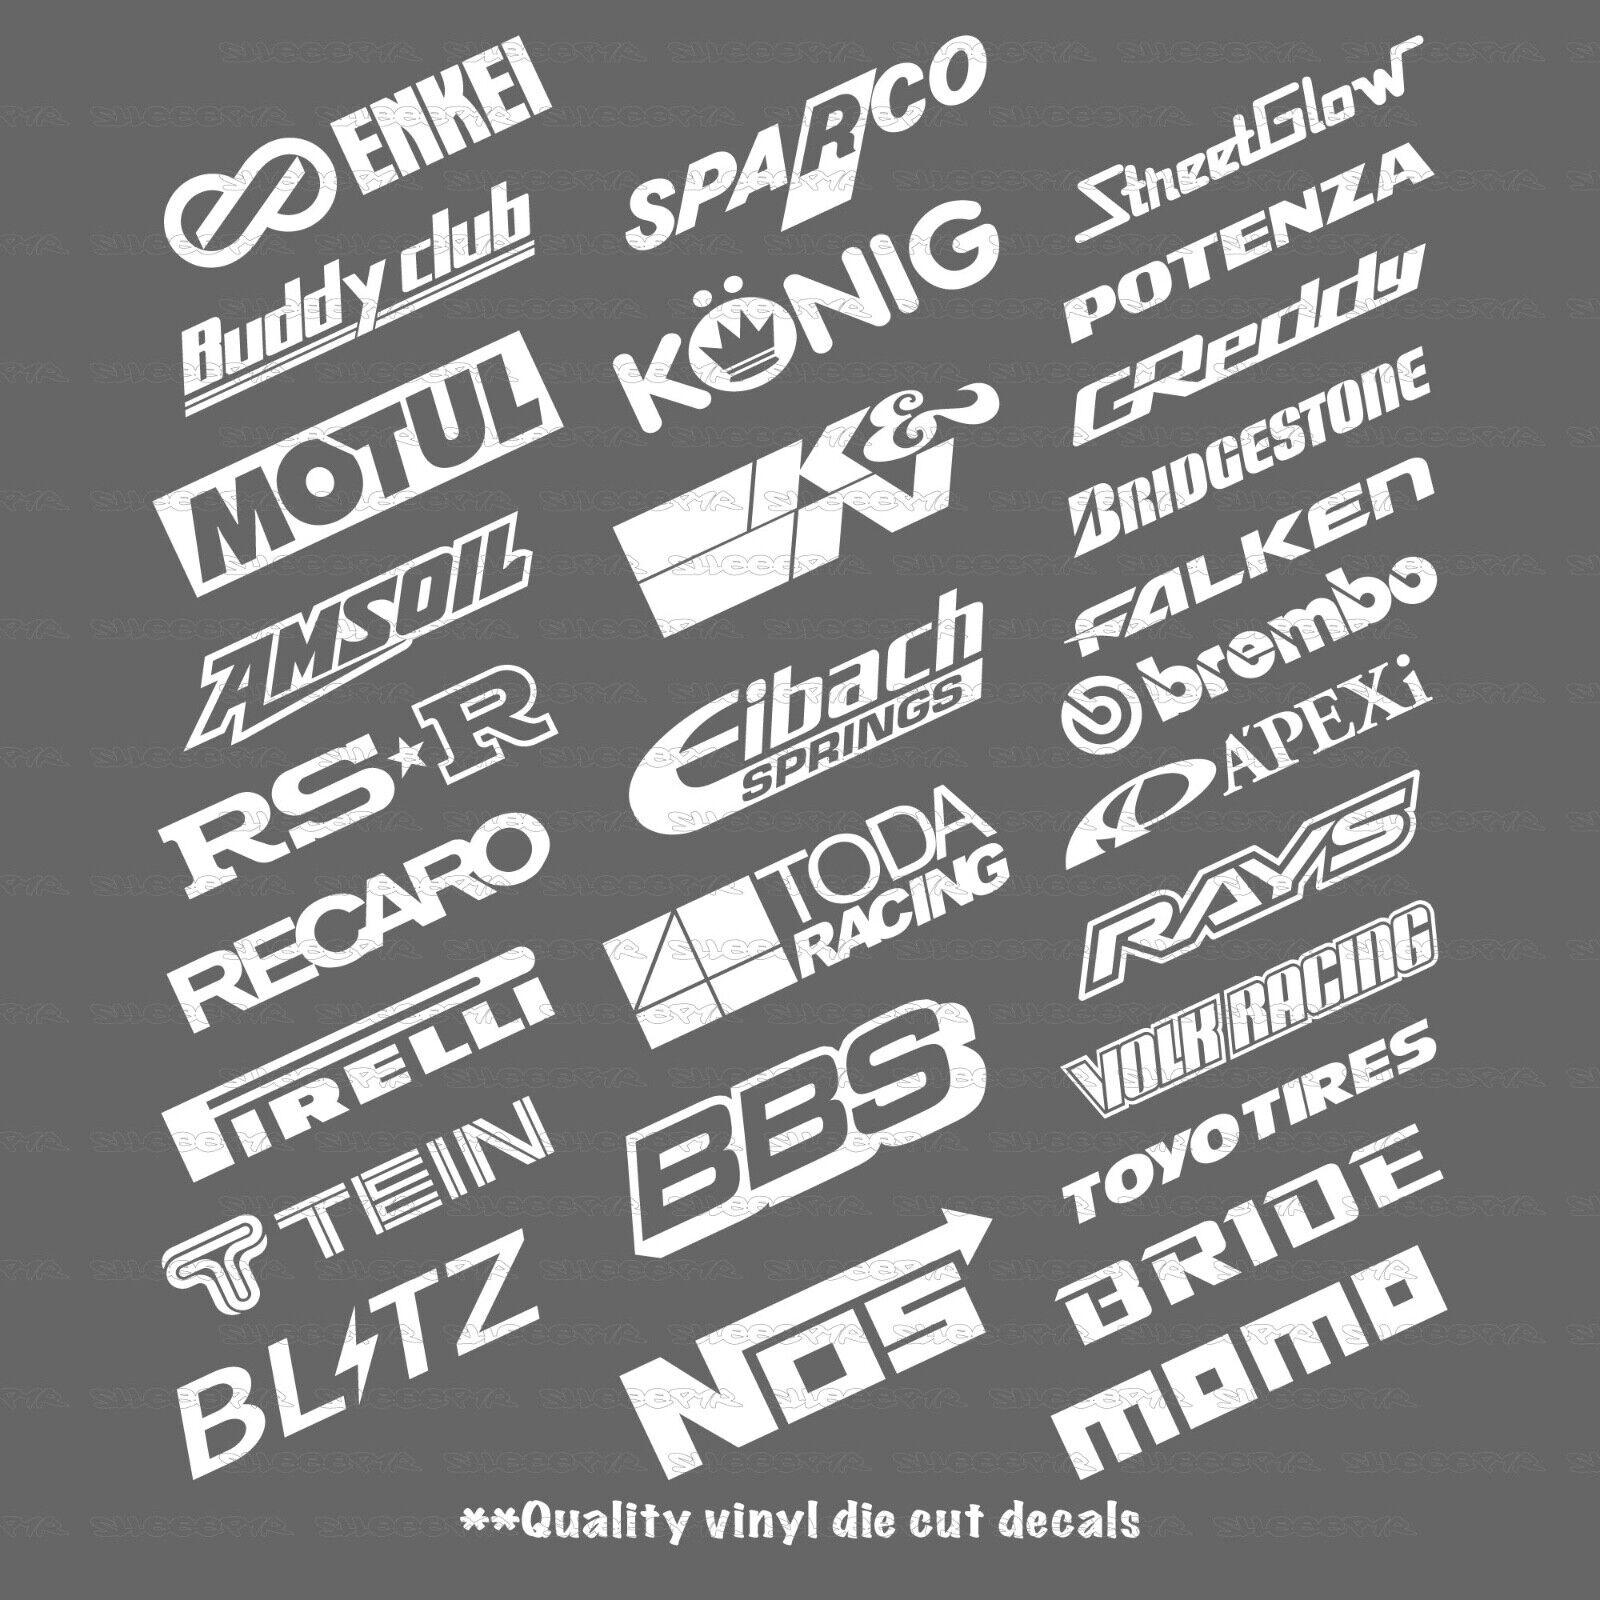 Automotive Sponsor Logos 15 Random Decals Stickers V1.2 JDM Racing Drift Turbo